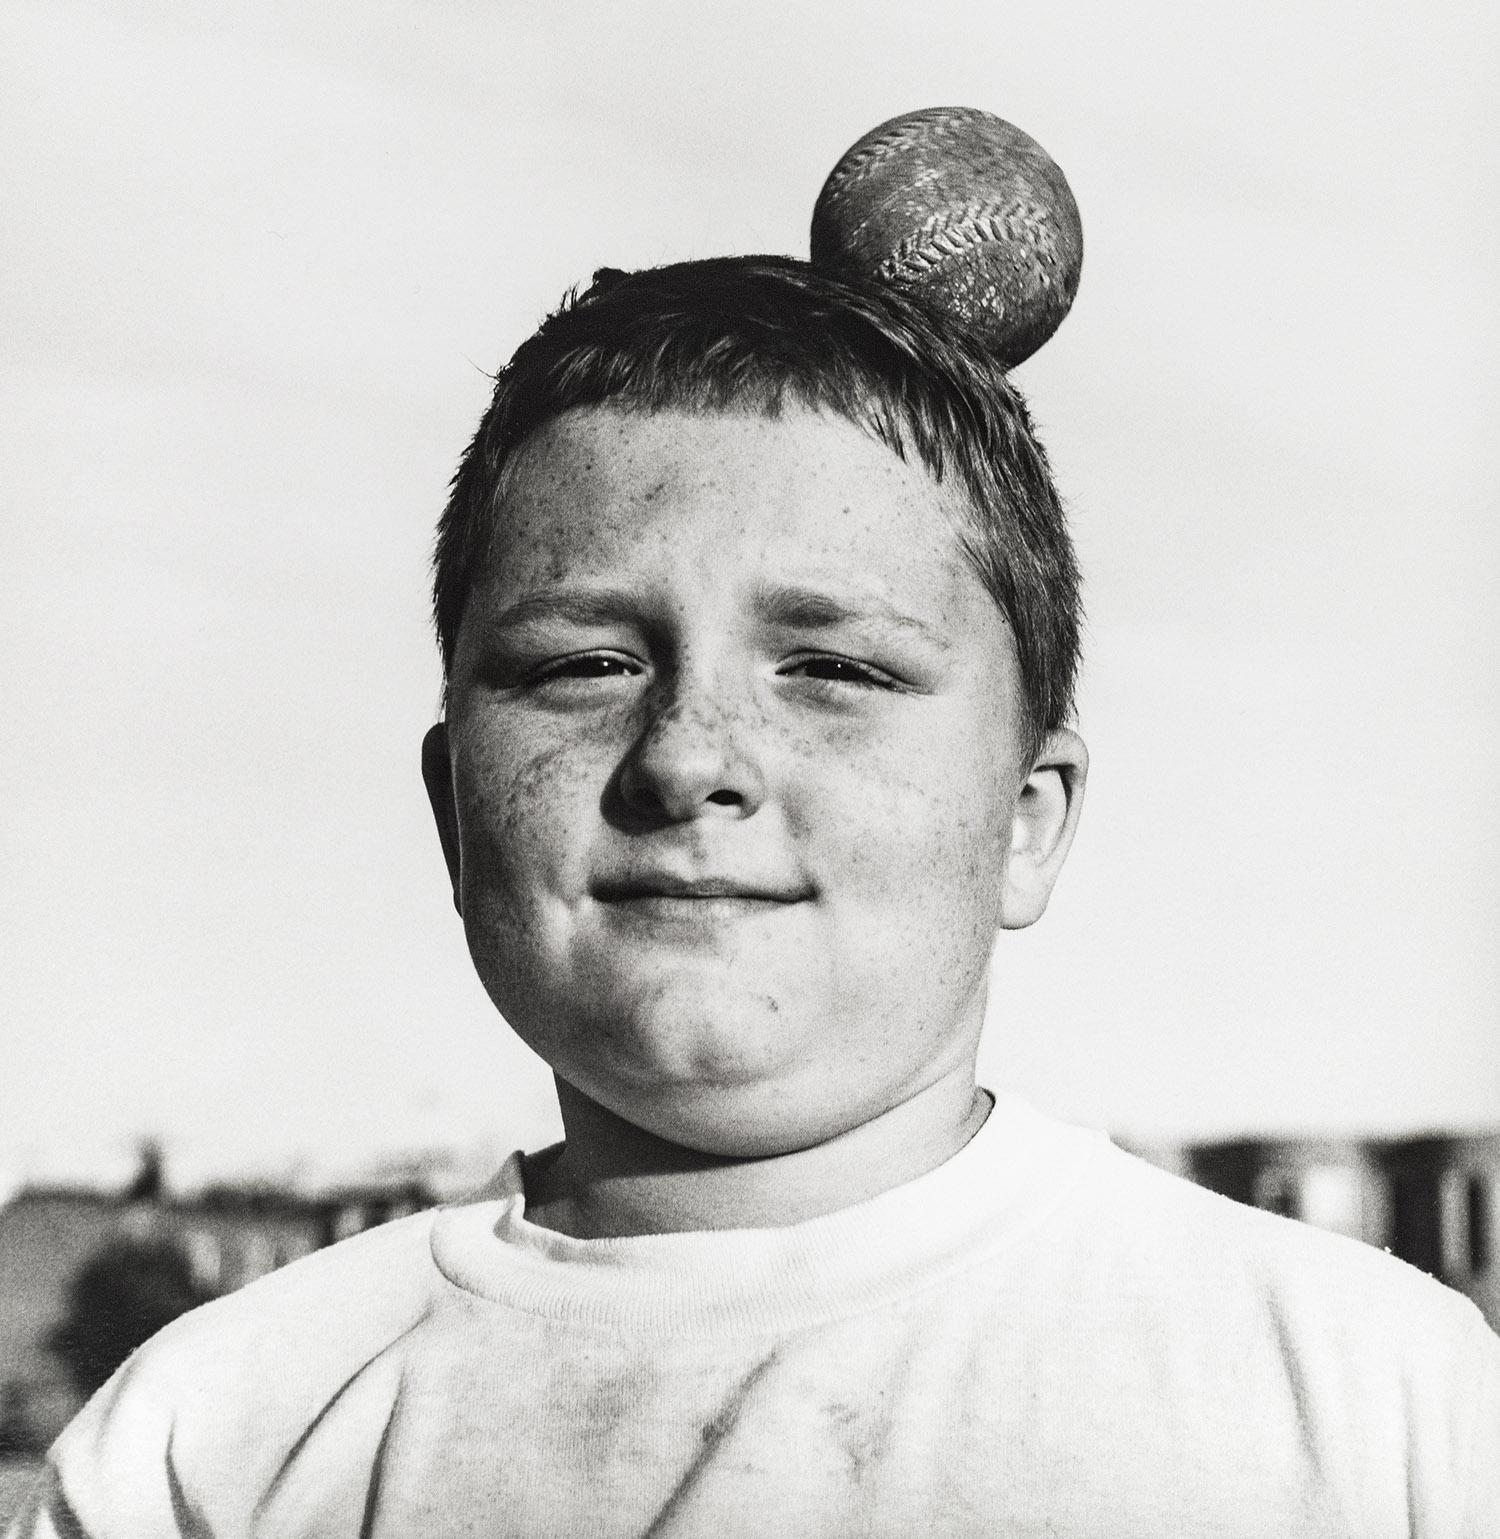 Boy Ball On Head Heading Home.jpg